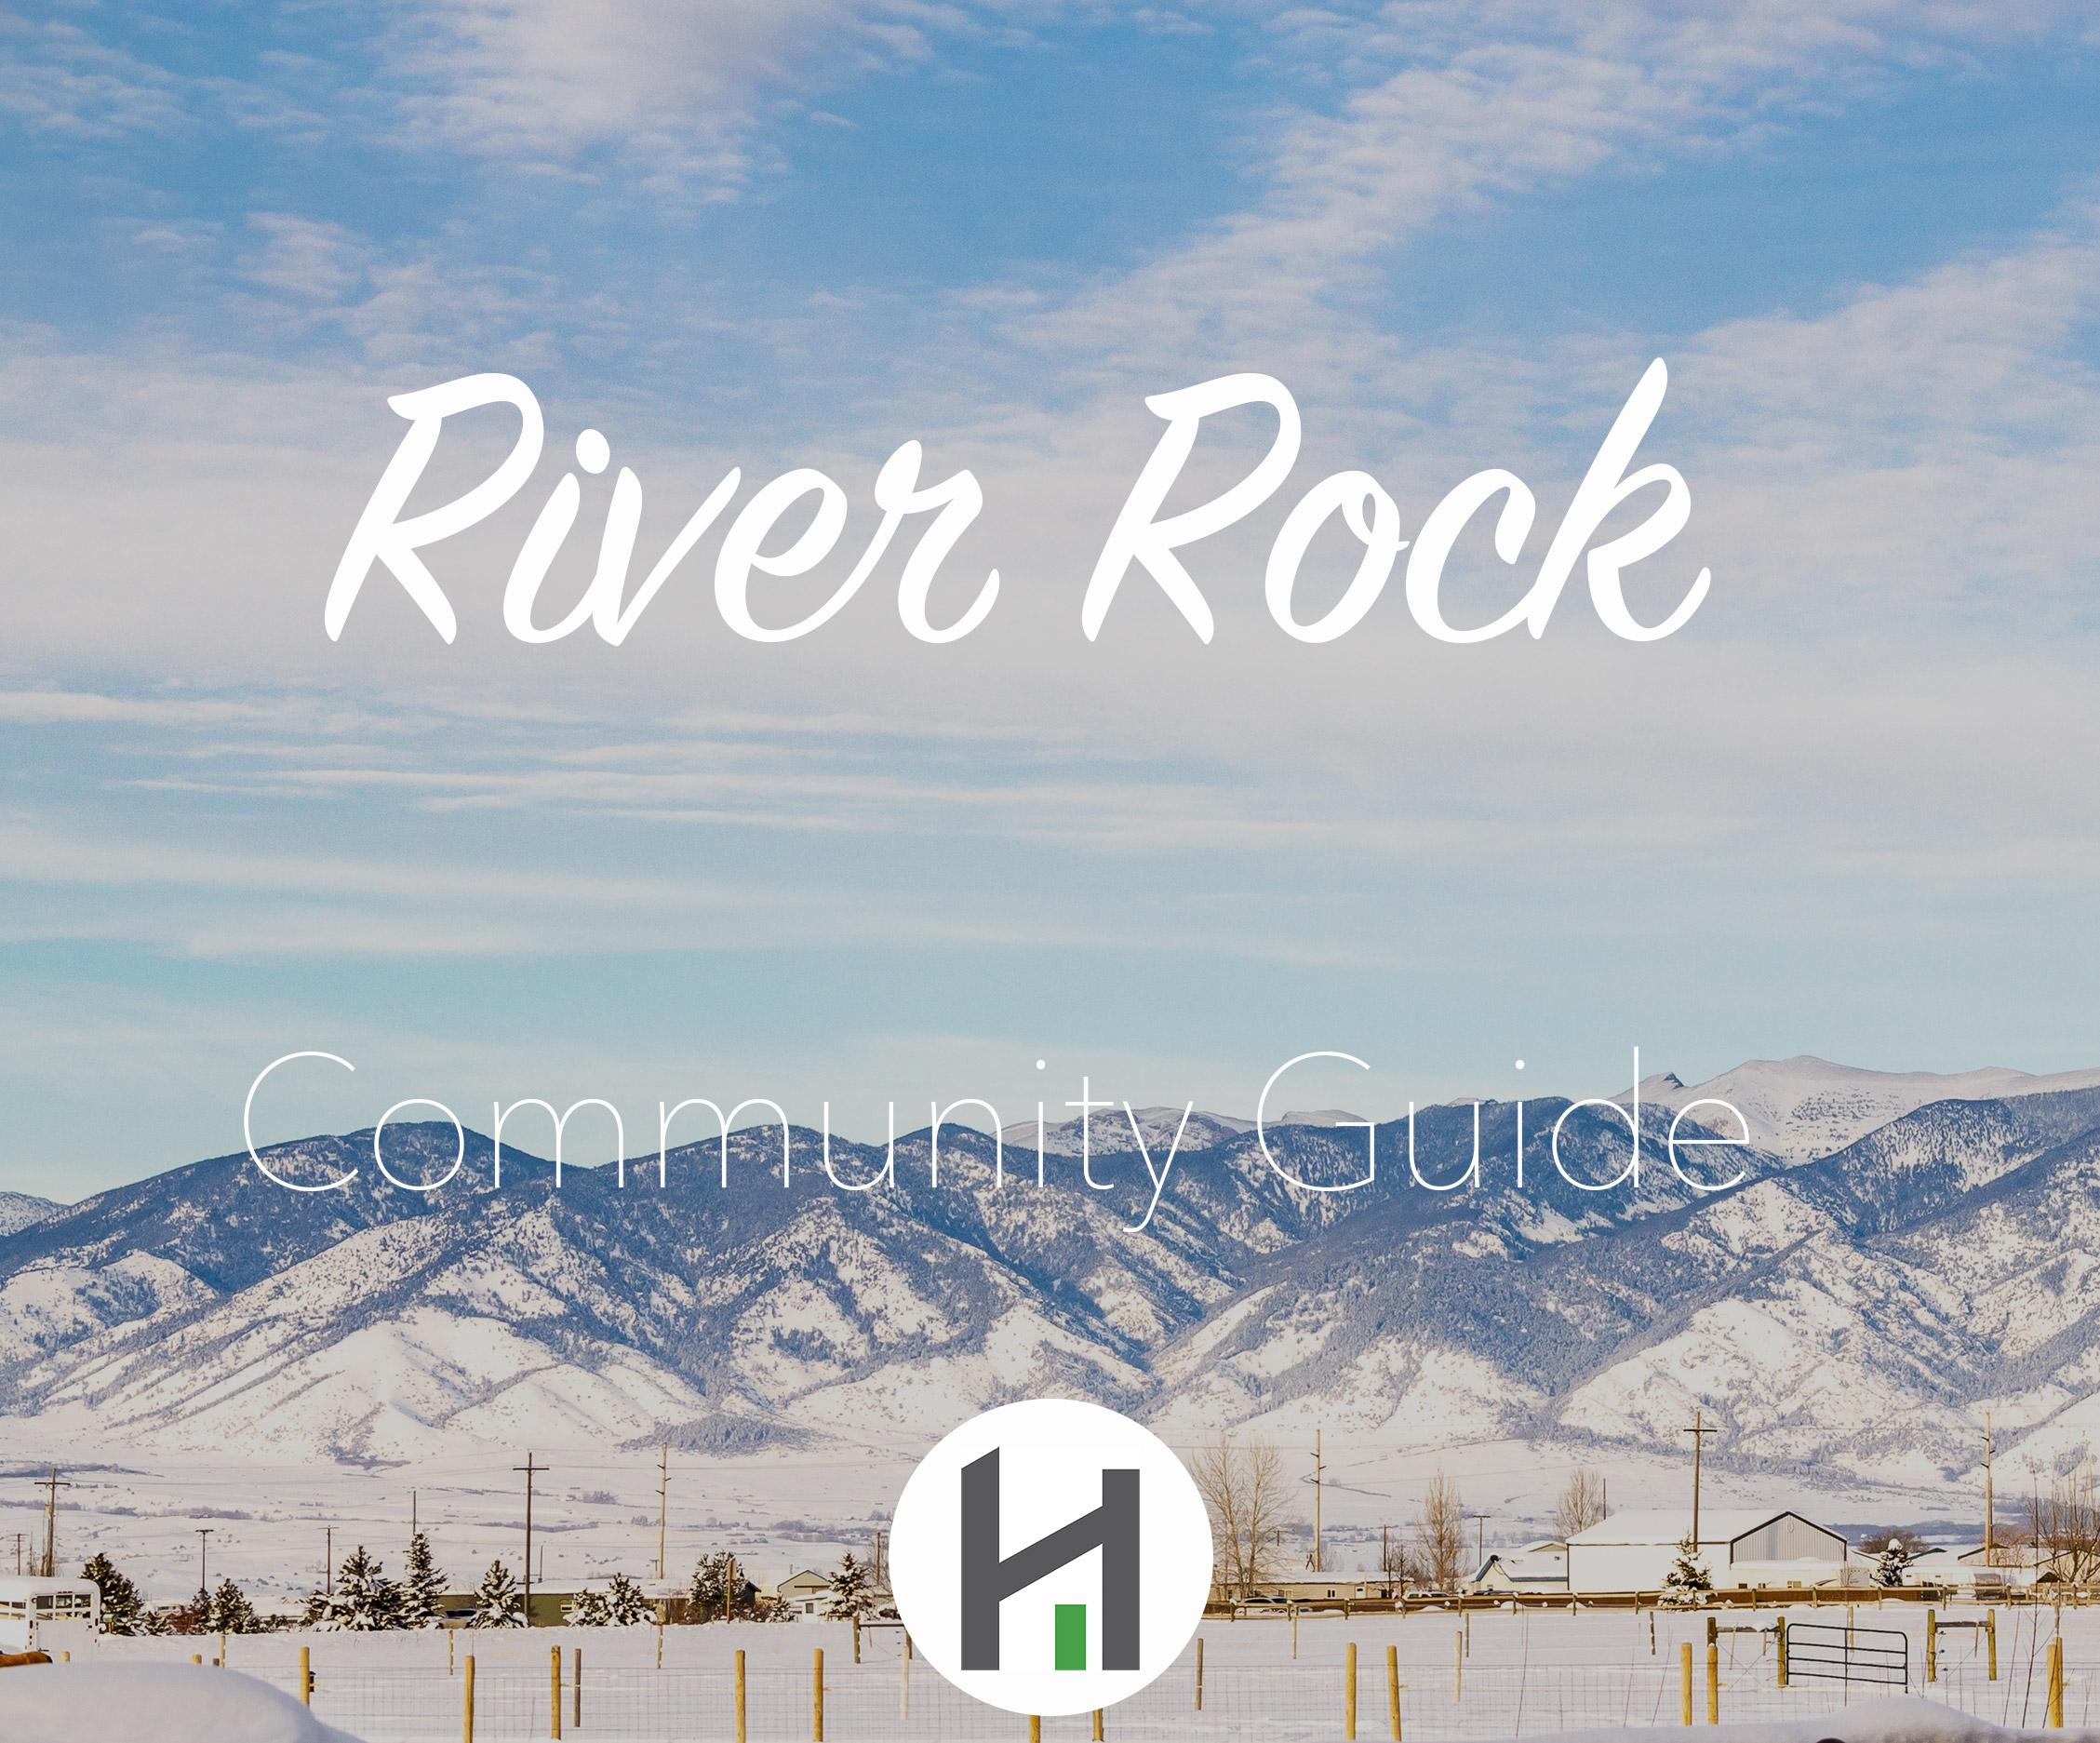 Find River Rock Homes and Real Estate in Belgrade MT